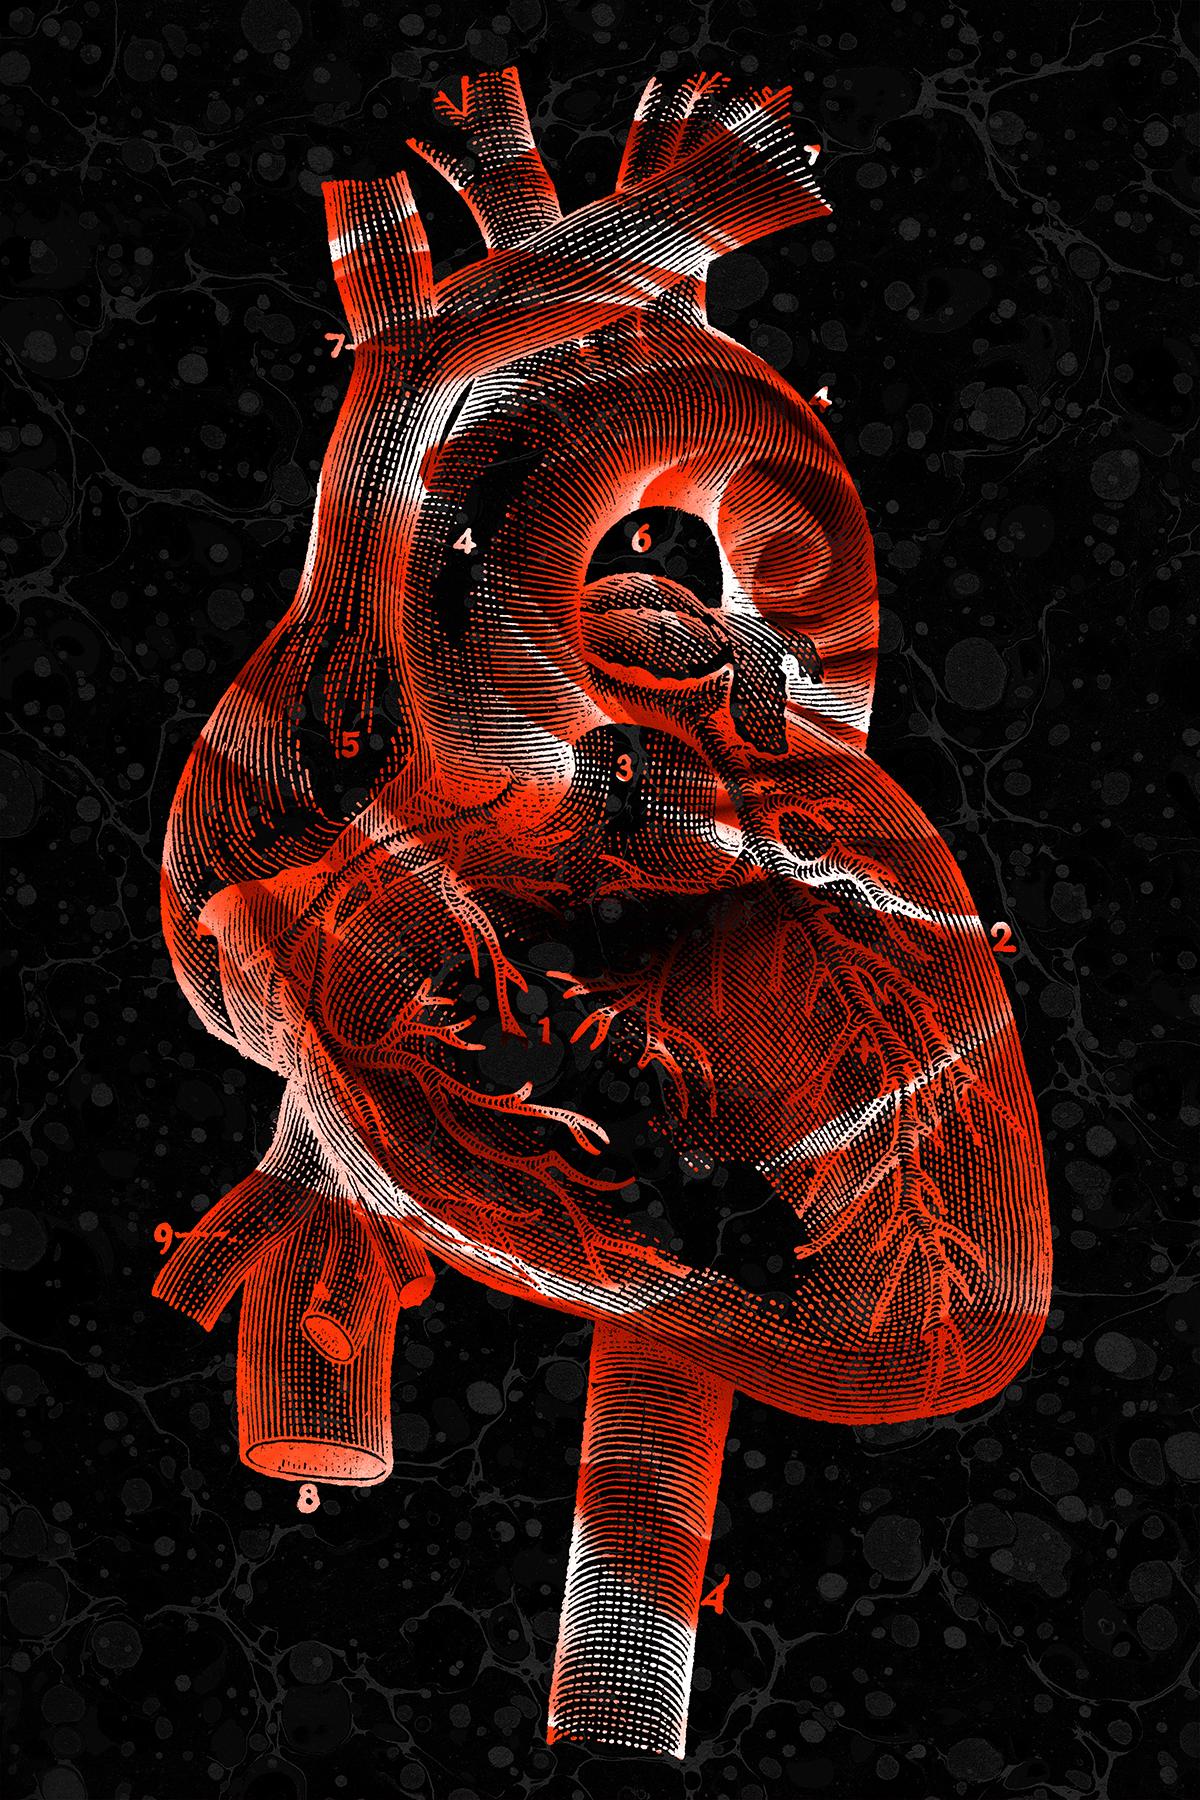 Vintage rose heart photo